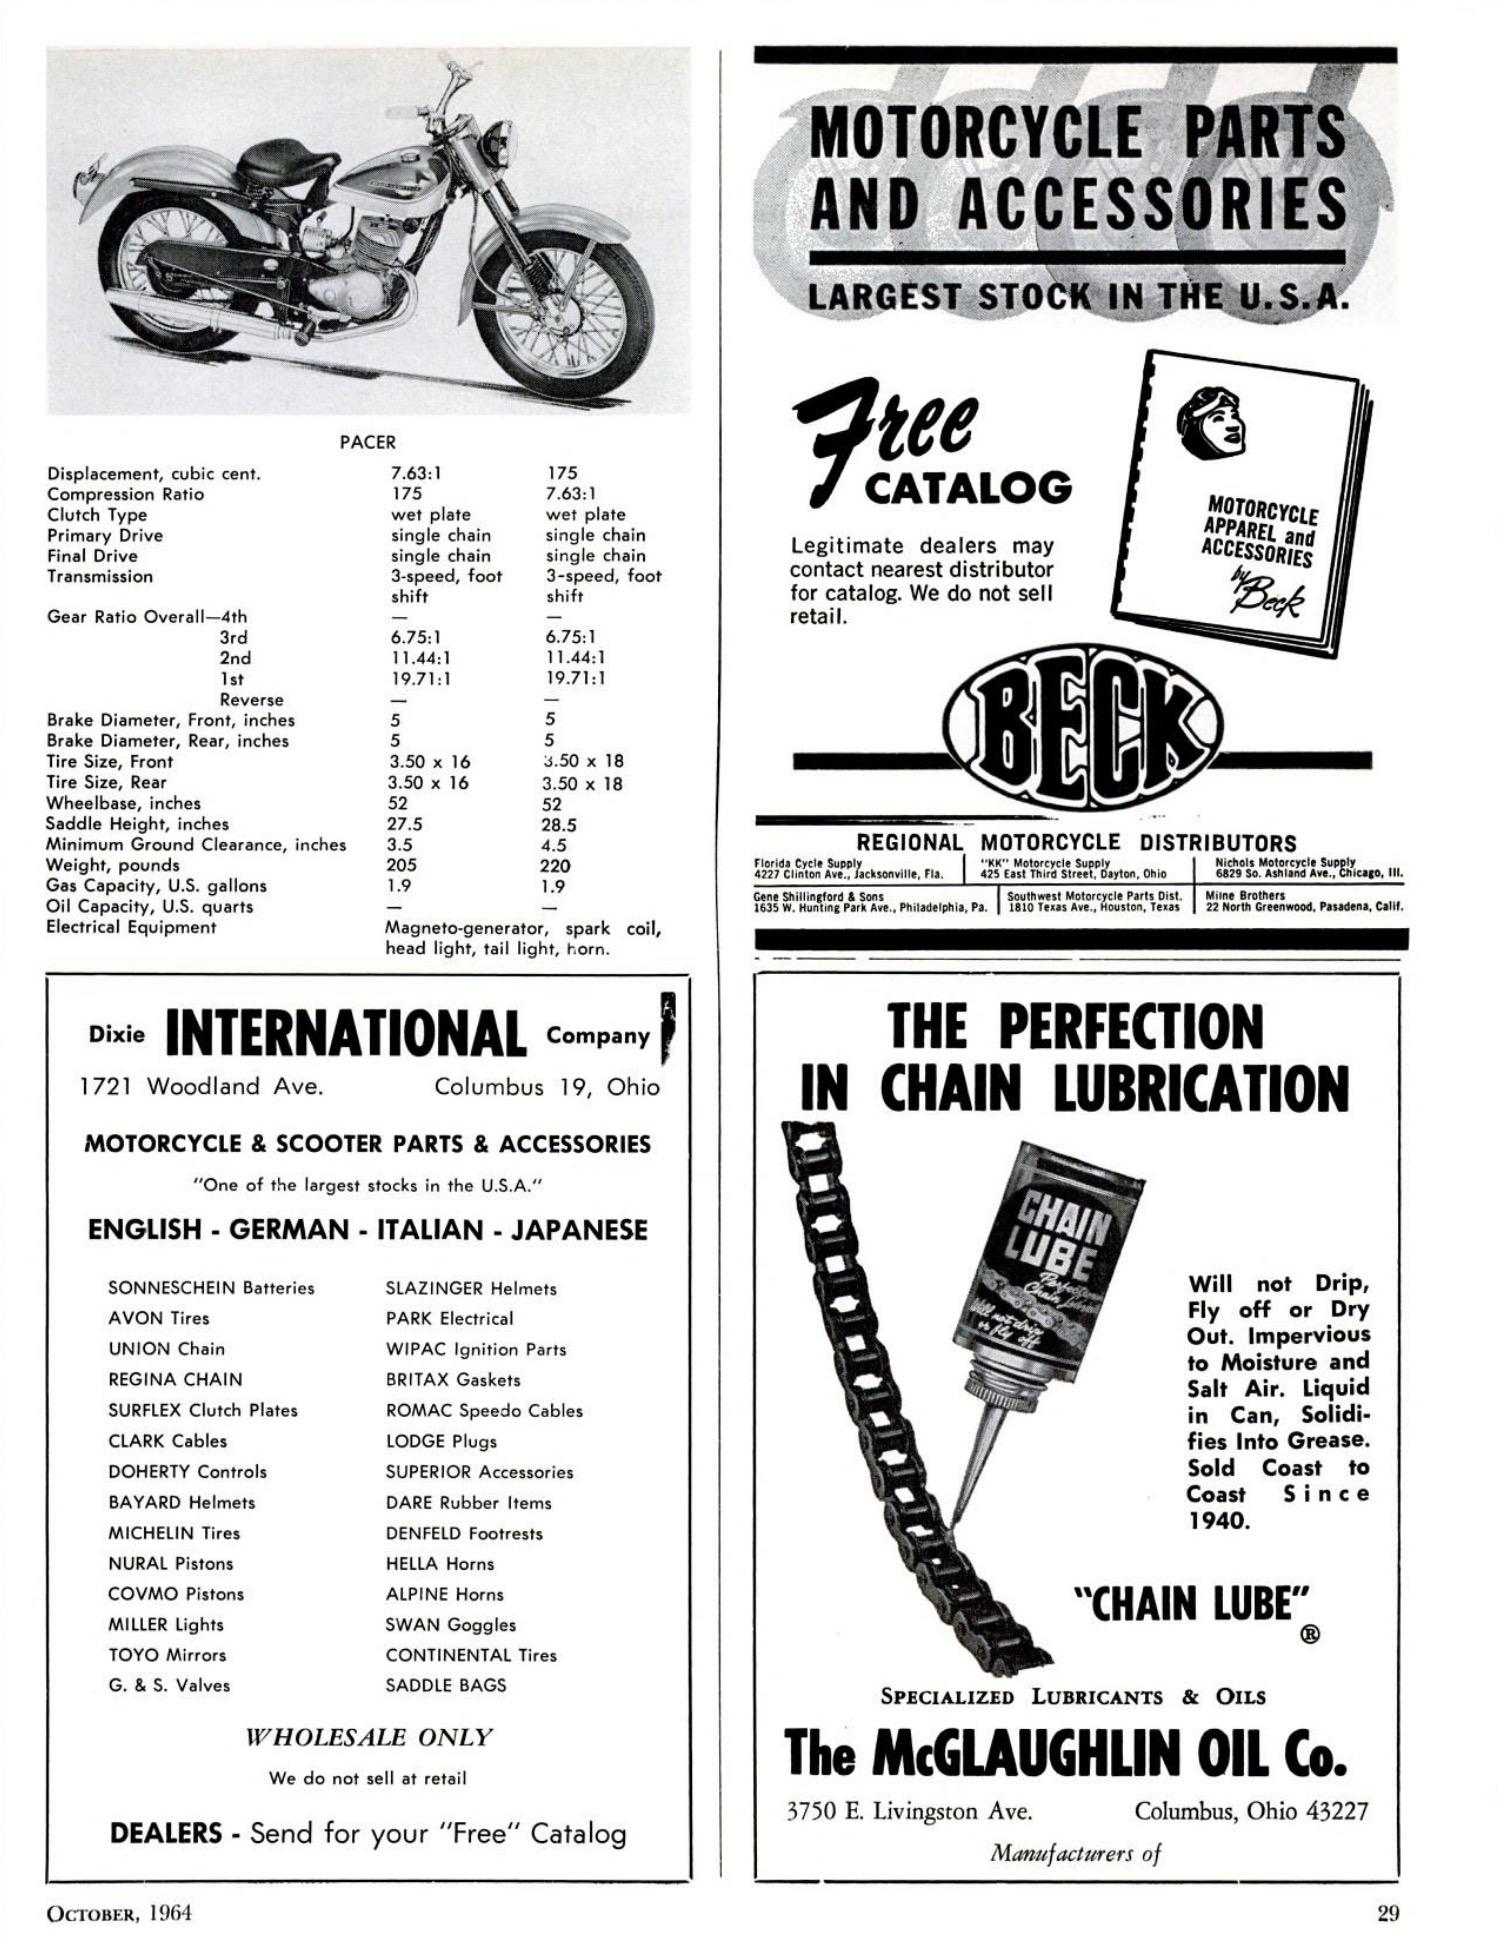 Modelos 65 - 03